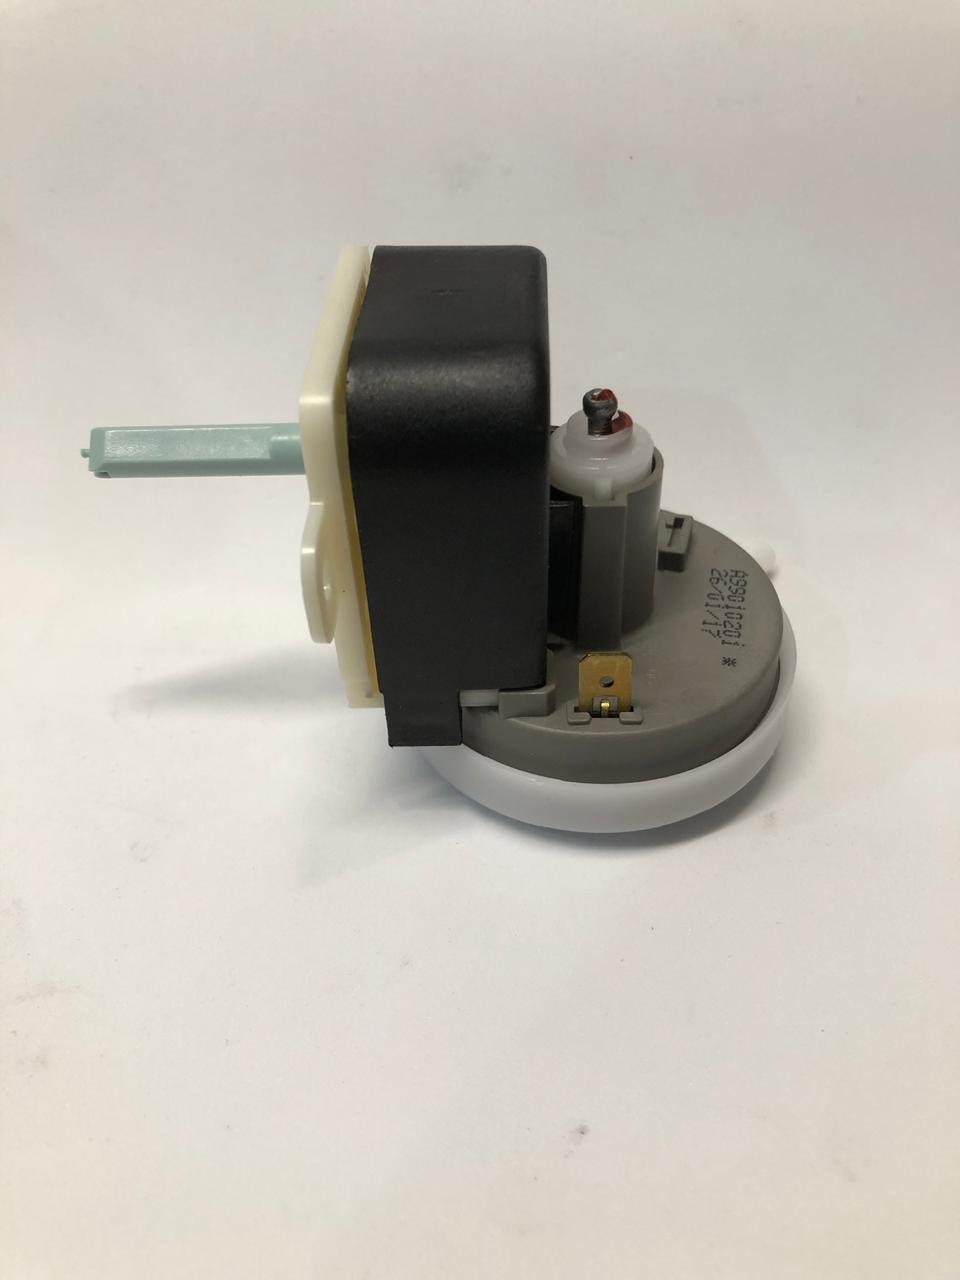 Pressostato 4 Niveis Para Lavadora Lt09e Electrolux - A99010201